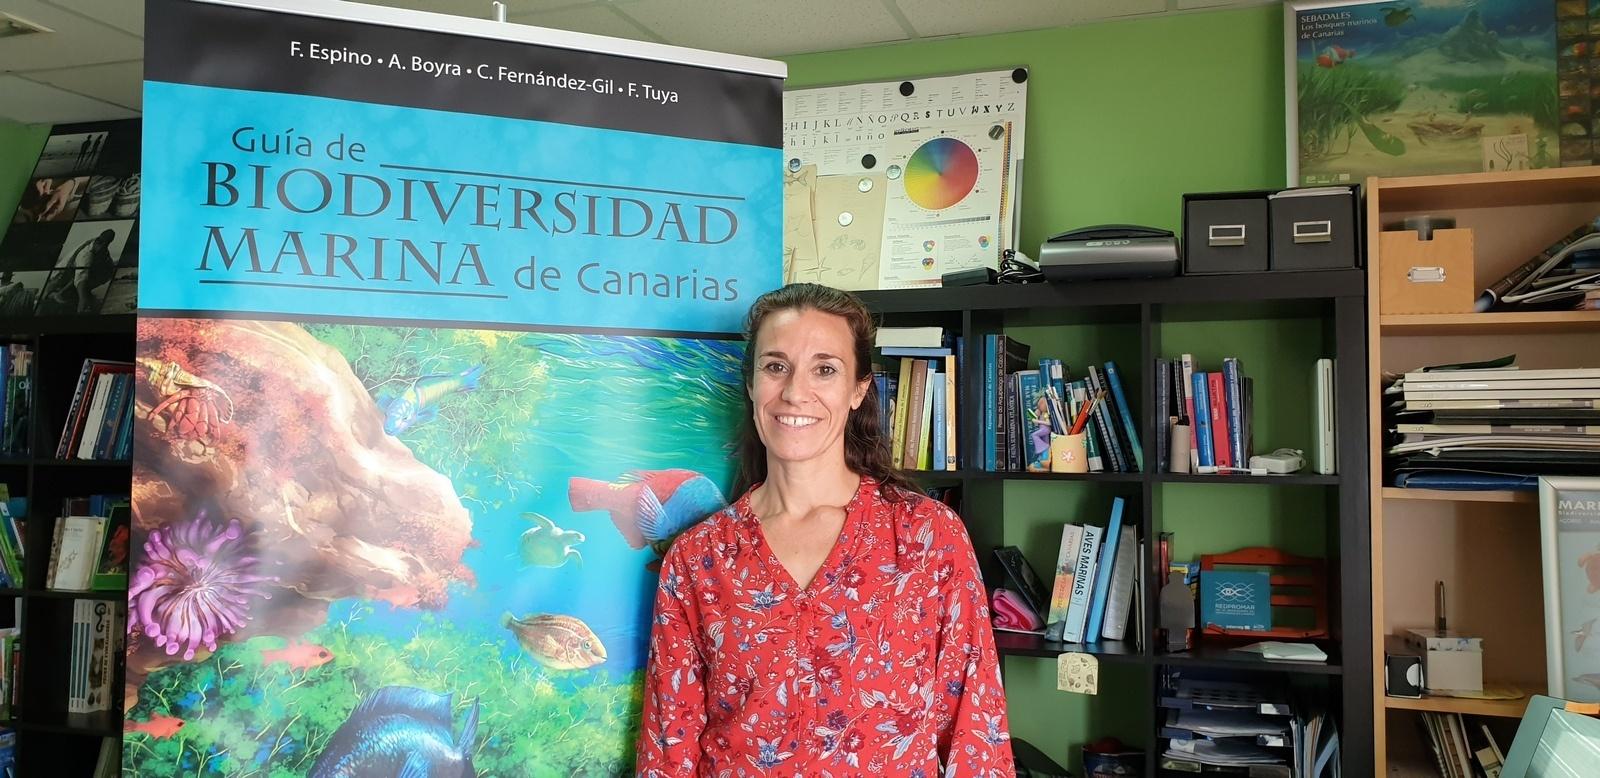 Cristina Fernández Gil